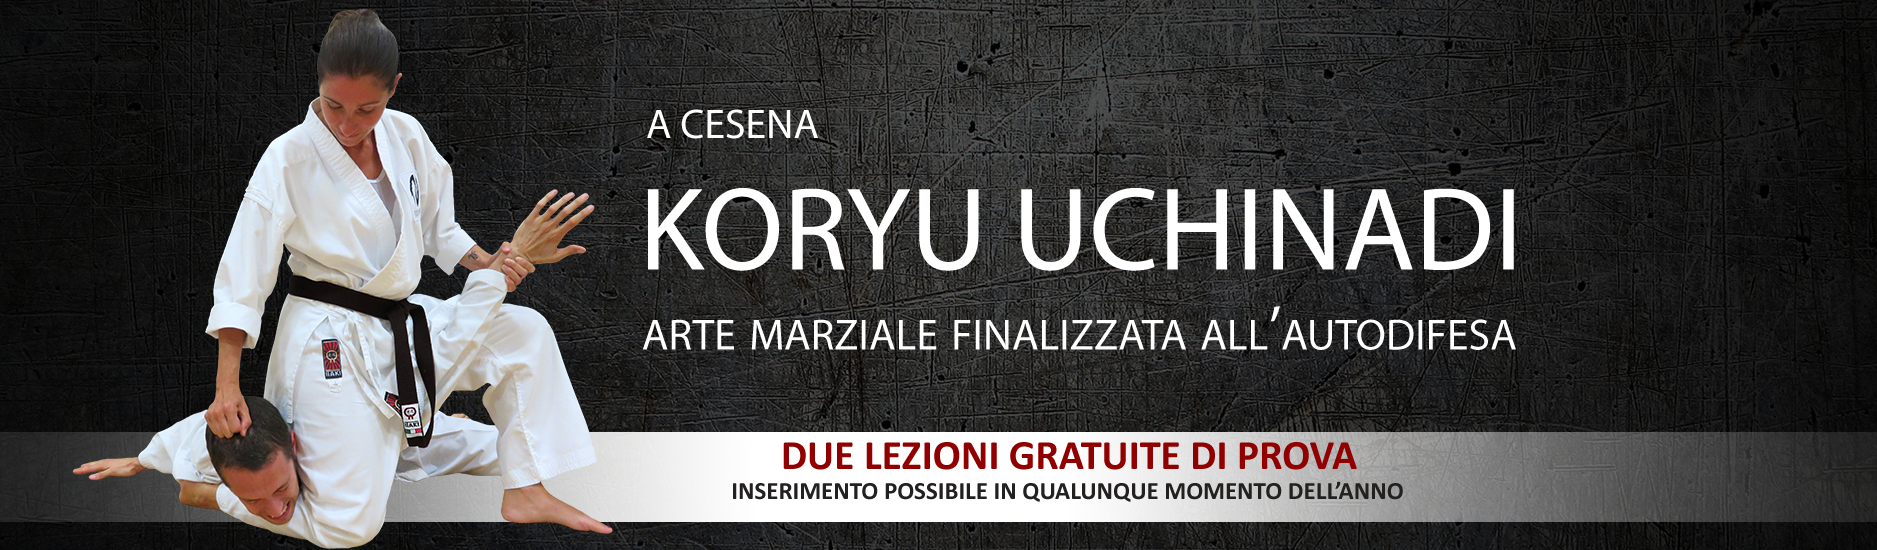 Koryukan Cesena: difesa personale a Cesena